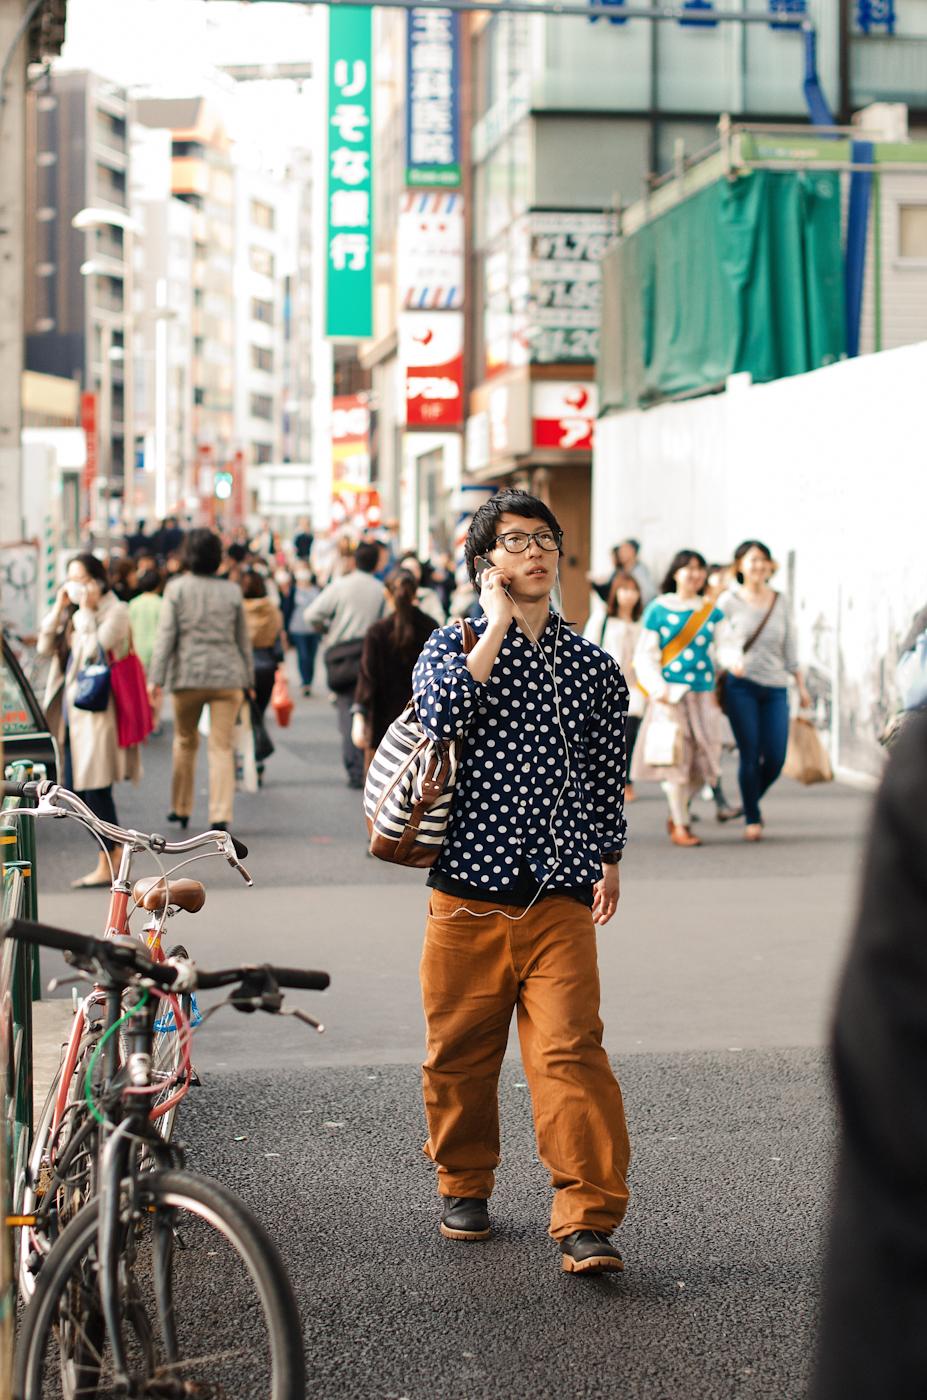 Polka dot street.